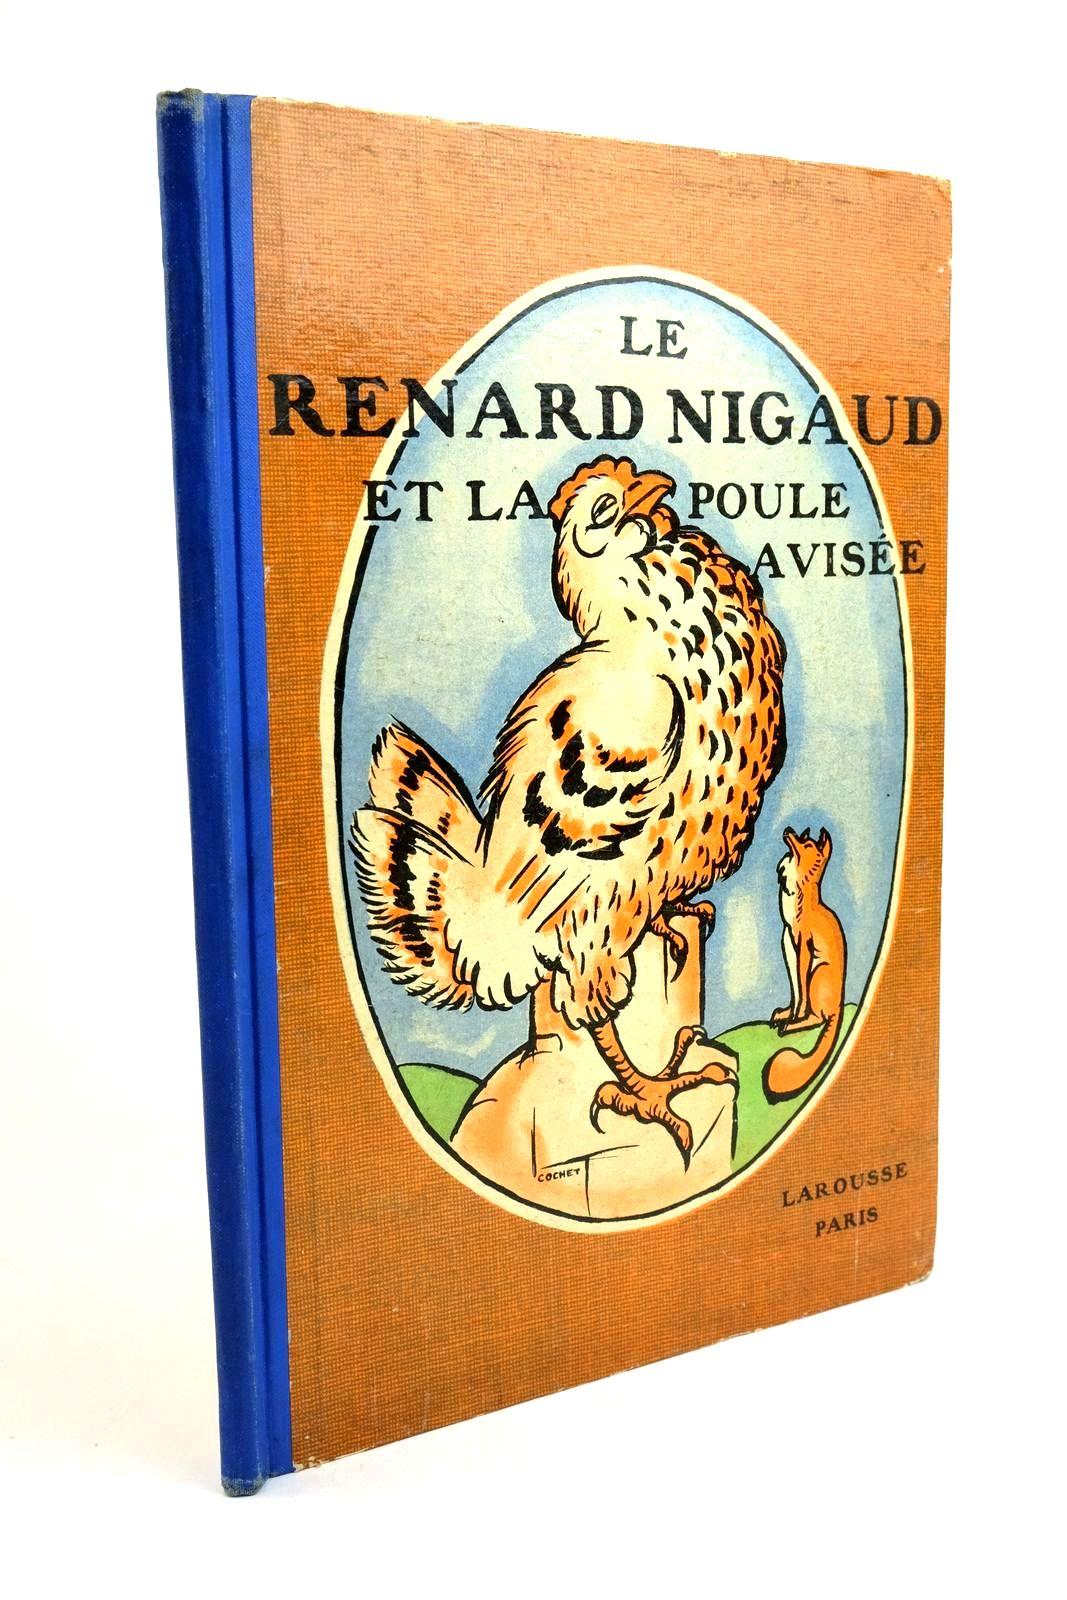 Photo of LE RENARD NIGAUD ET LA POULE AVISEE- Stock Number: 1321767